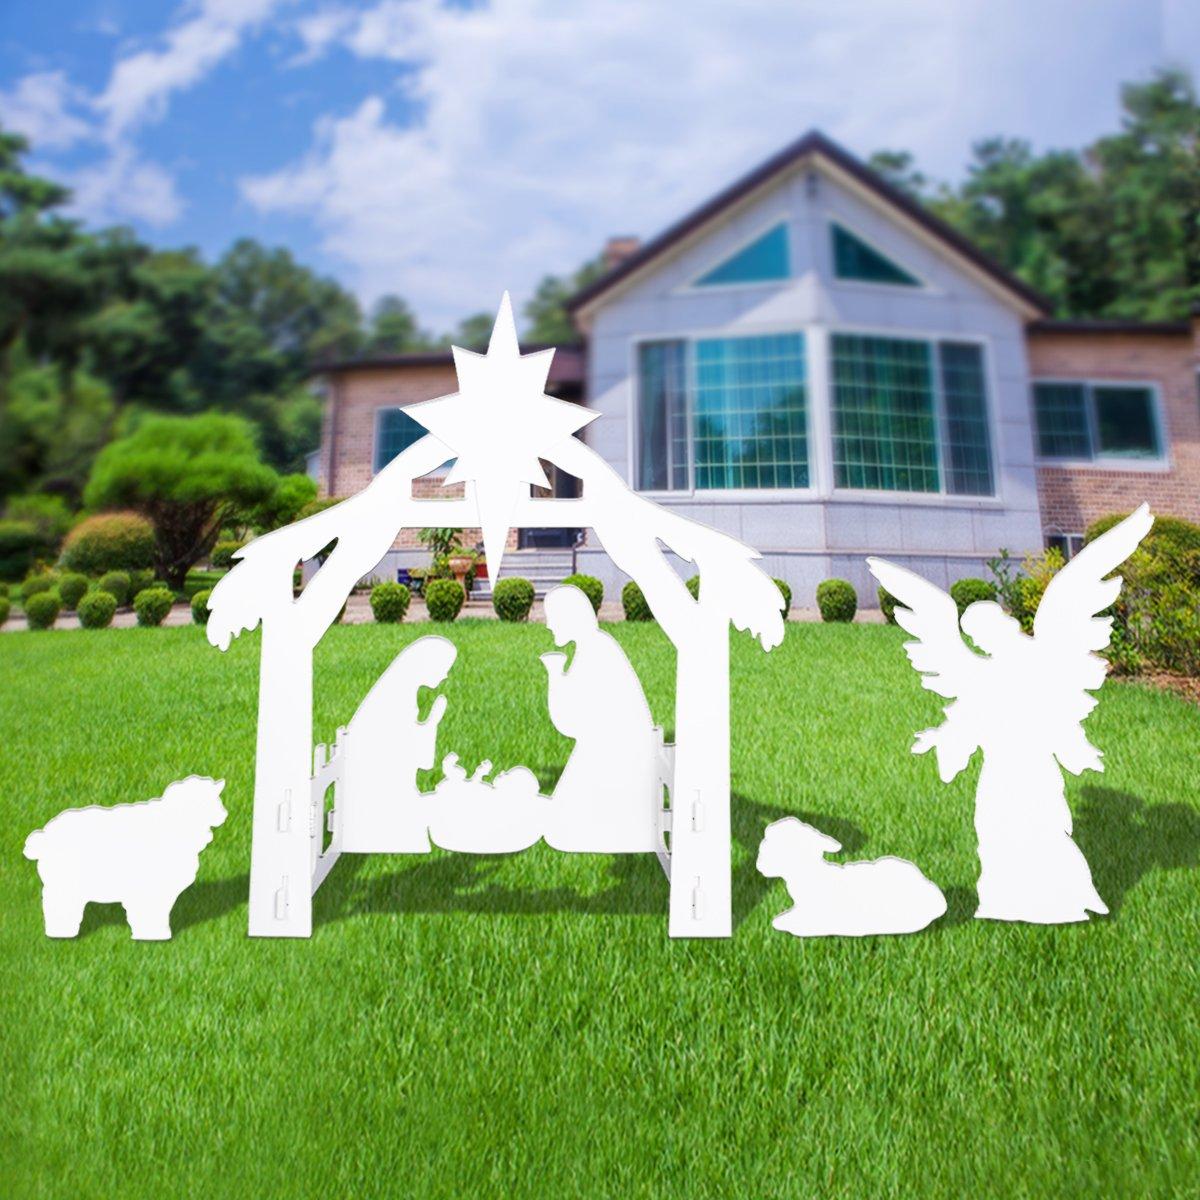 Outdoor Nativity Set - Full Yard Nativity Scene with Holy Family and Angle by BESTOMZ